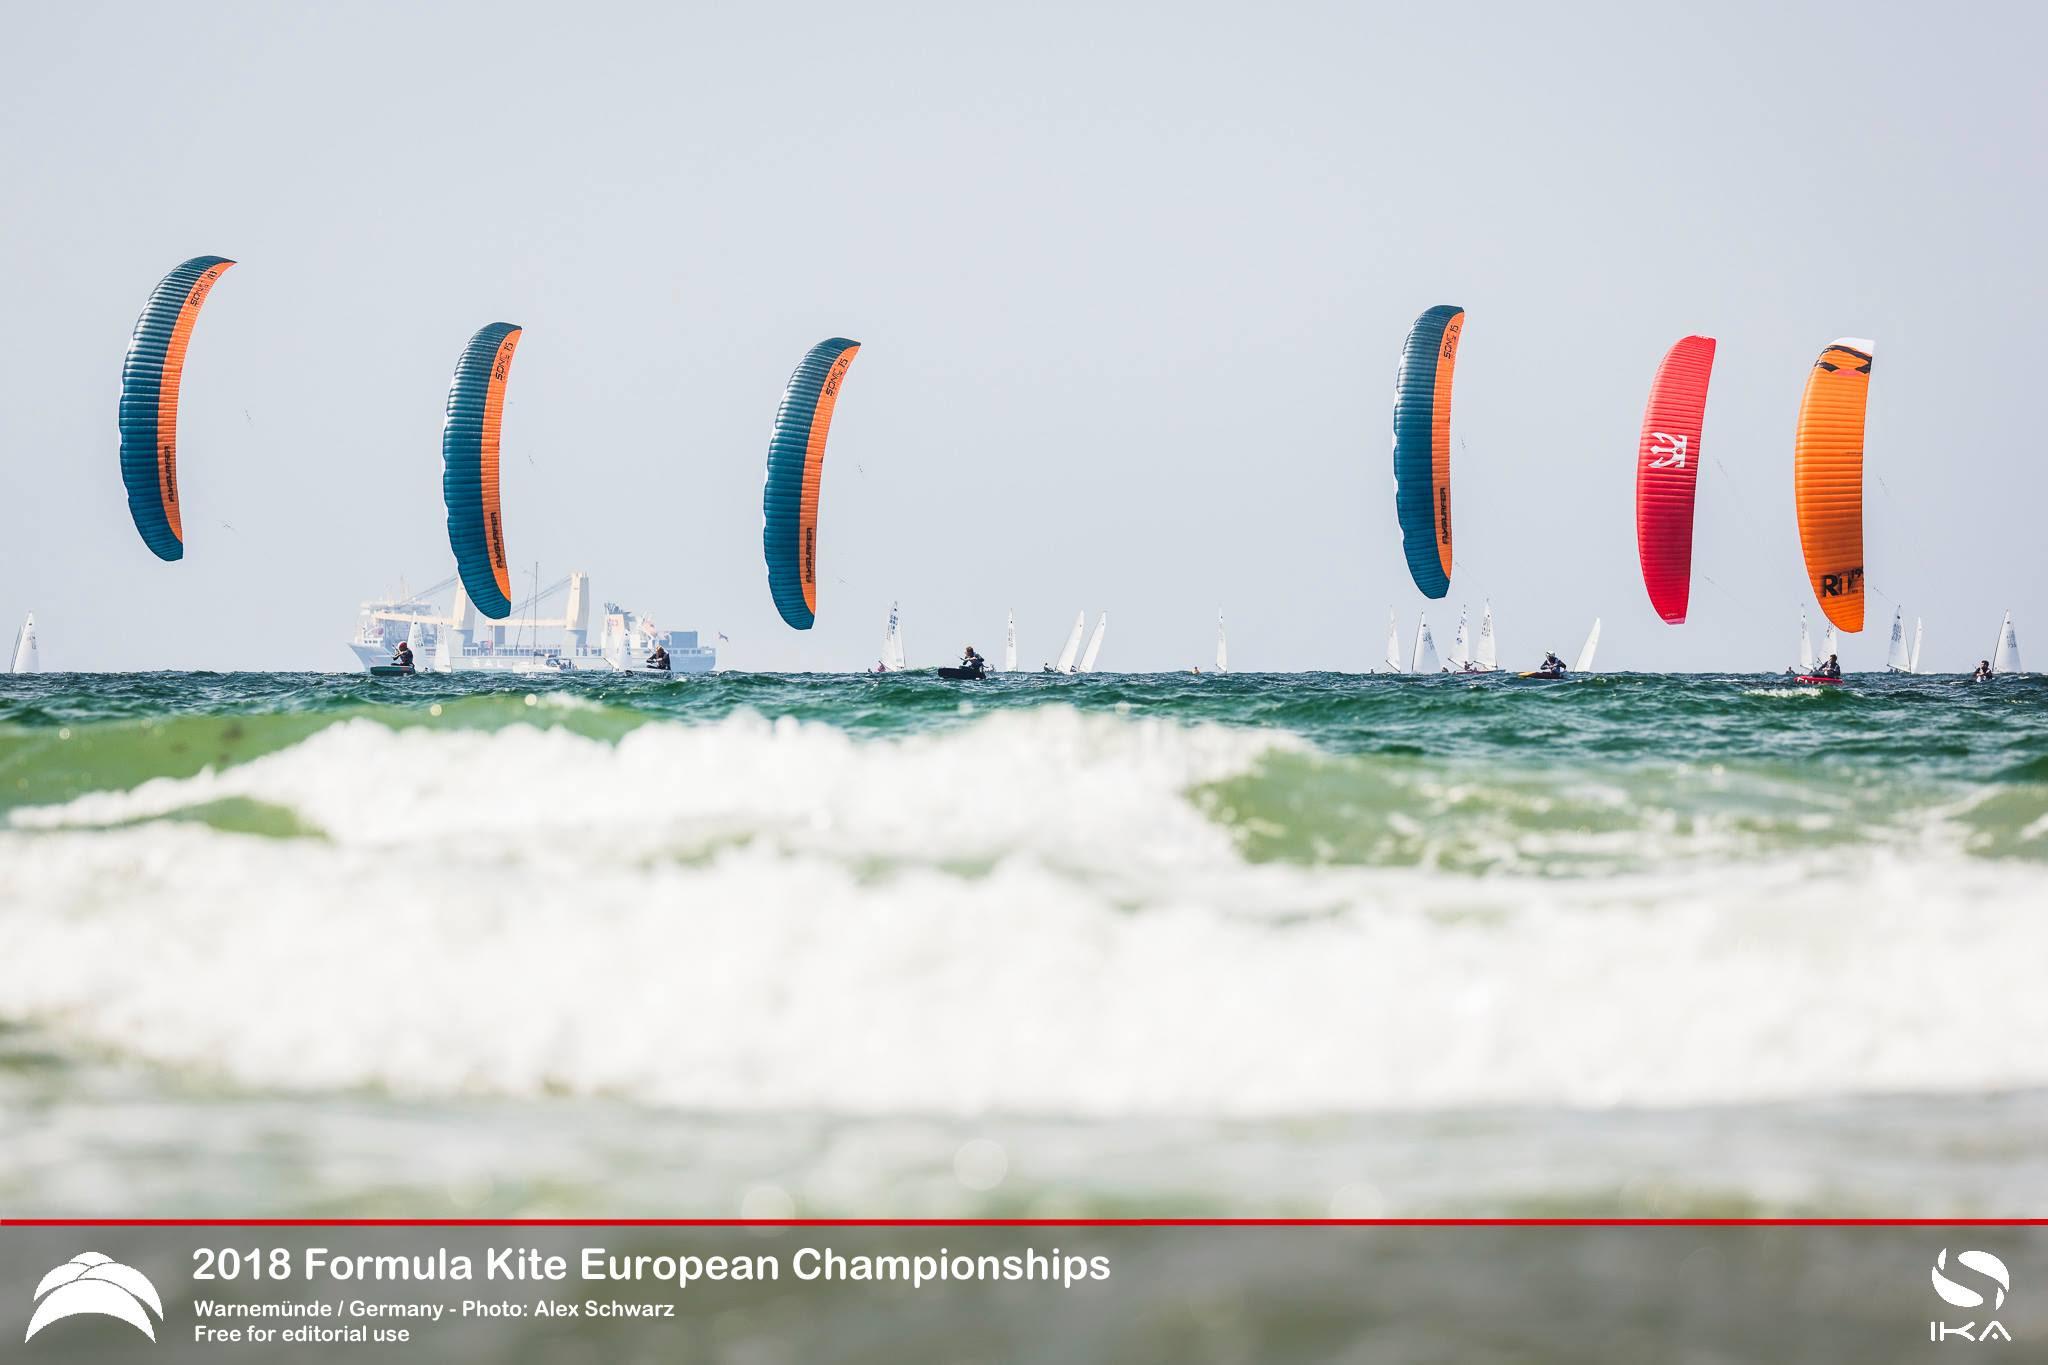 Formula Kite European Championship Heats